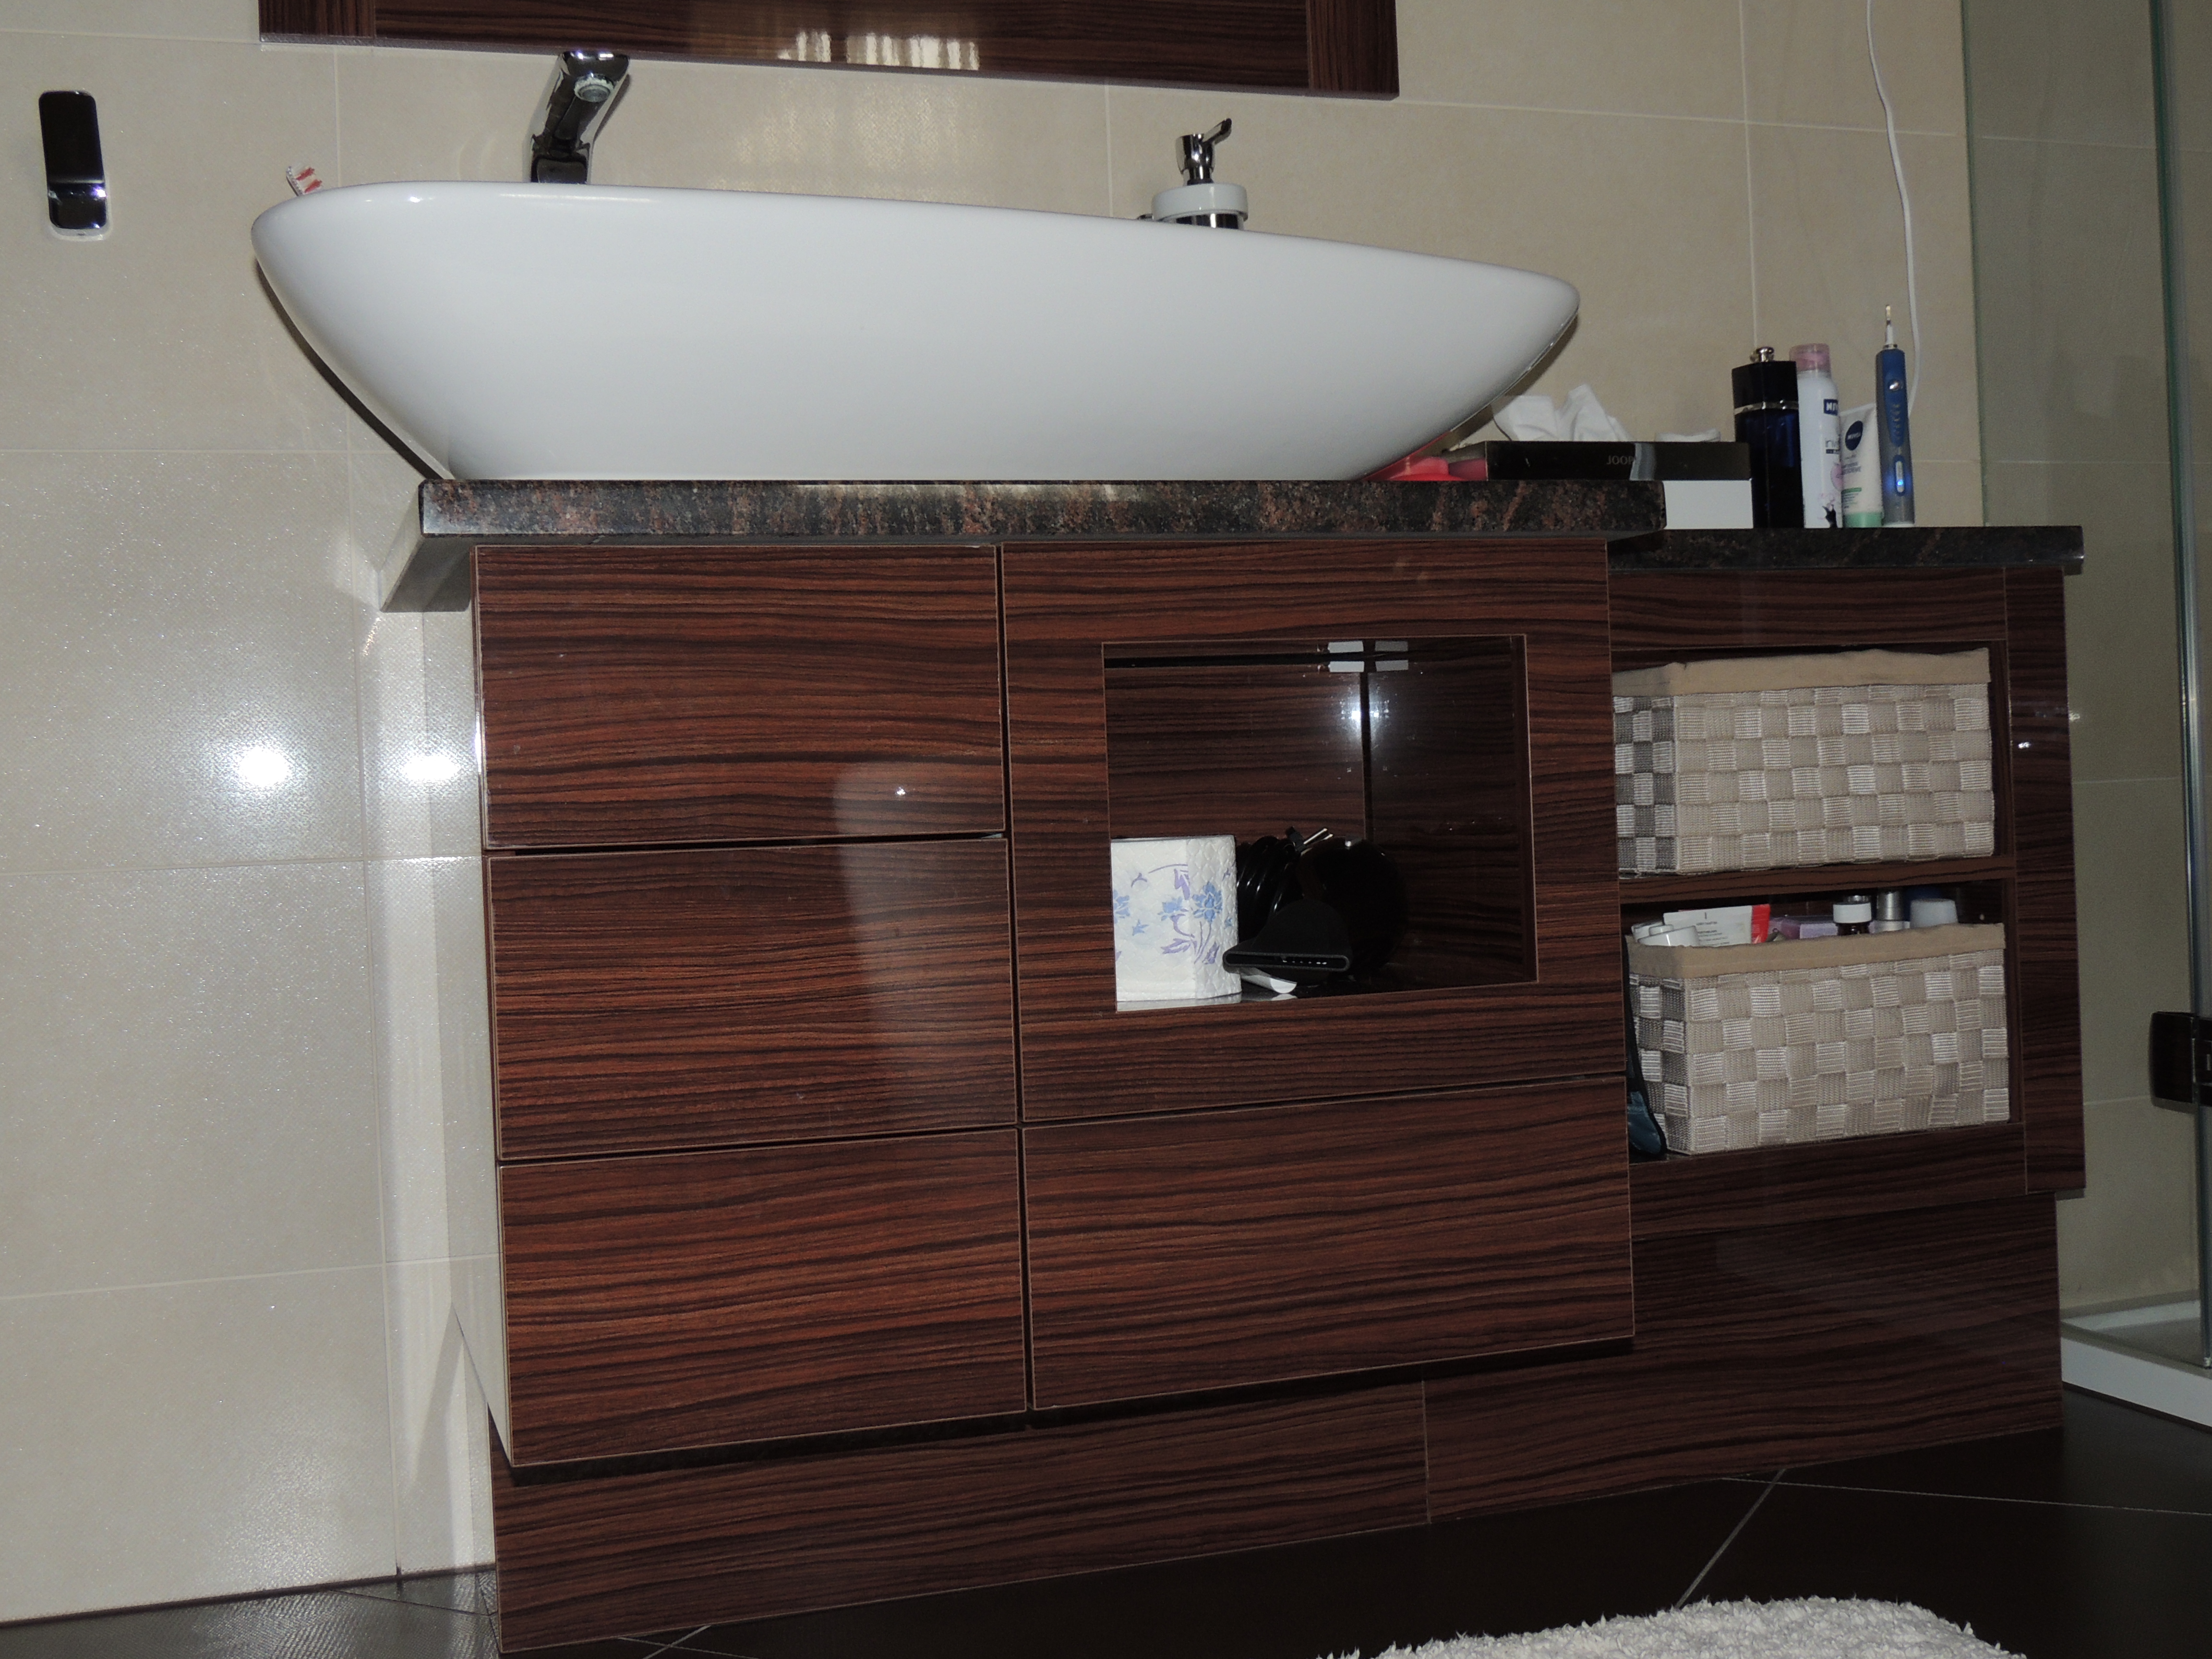 m bel f r das bad s rga fagy ngy bt. Black Bedroom Furniture Sets. Home Design Ideas